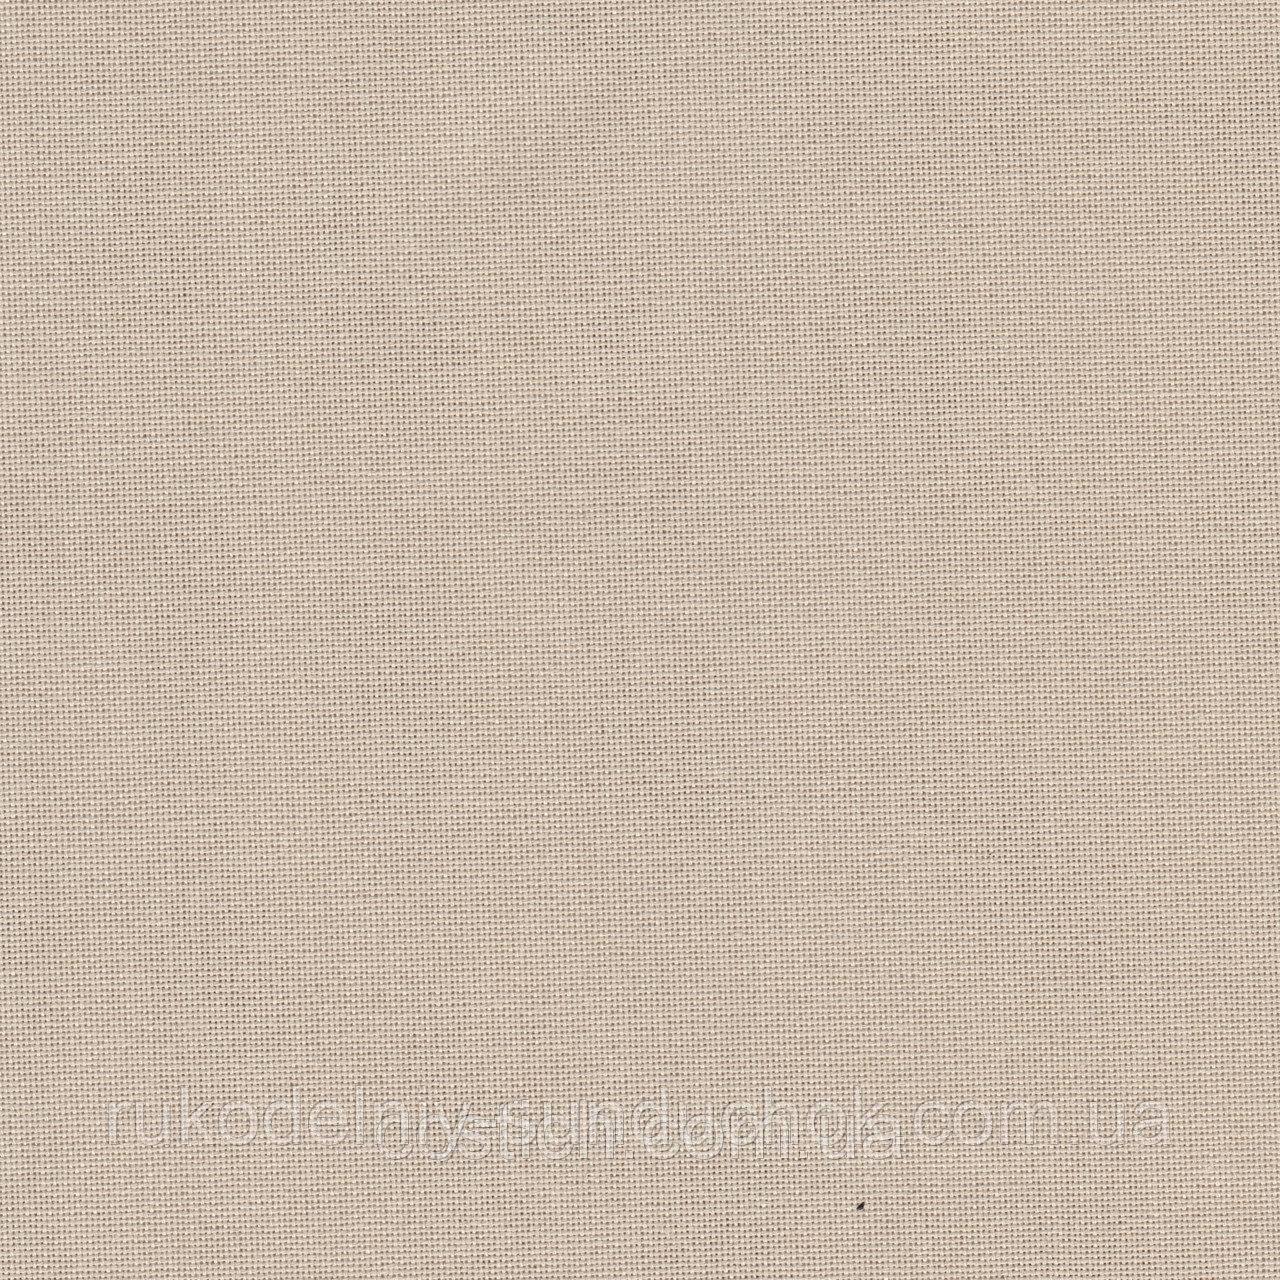 Ткань равномерного переплетения Zweigart Murano Lugana 32 ct. 3984/770 Platinum,China White (платиновый)